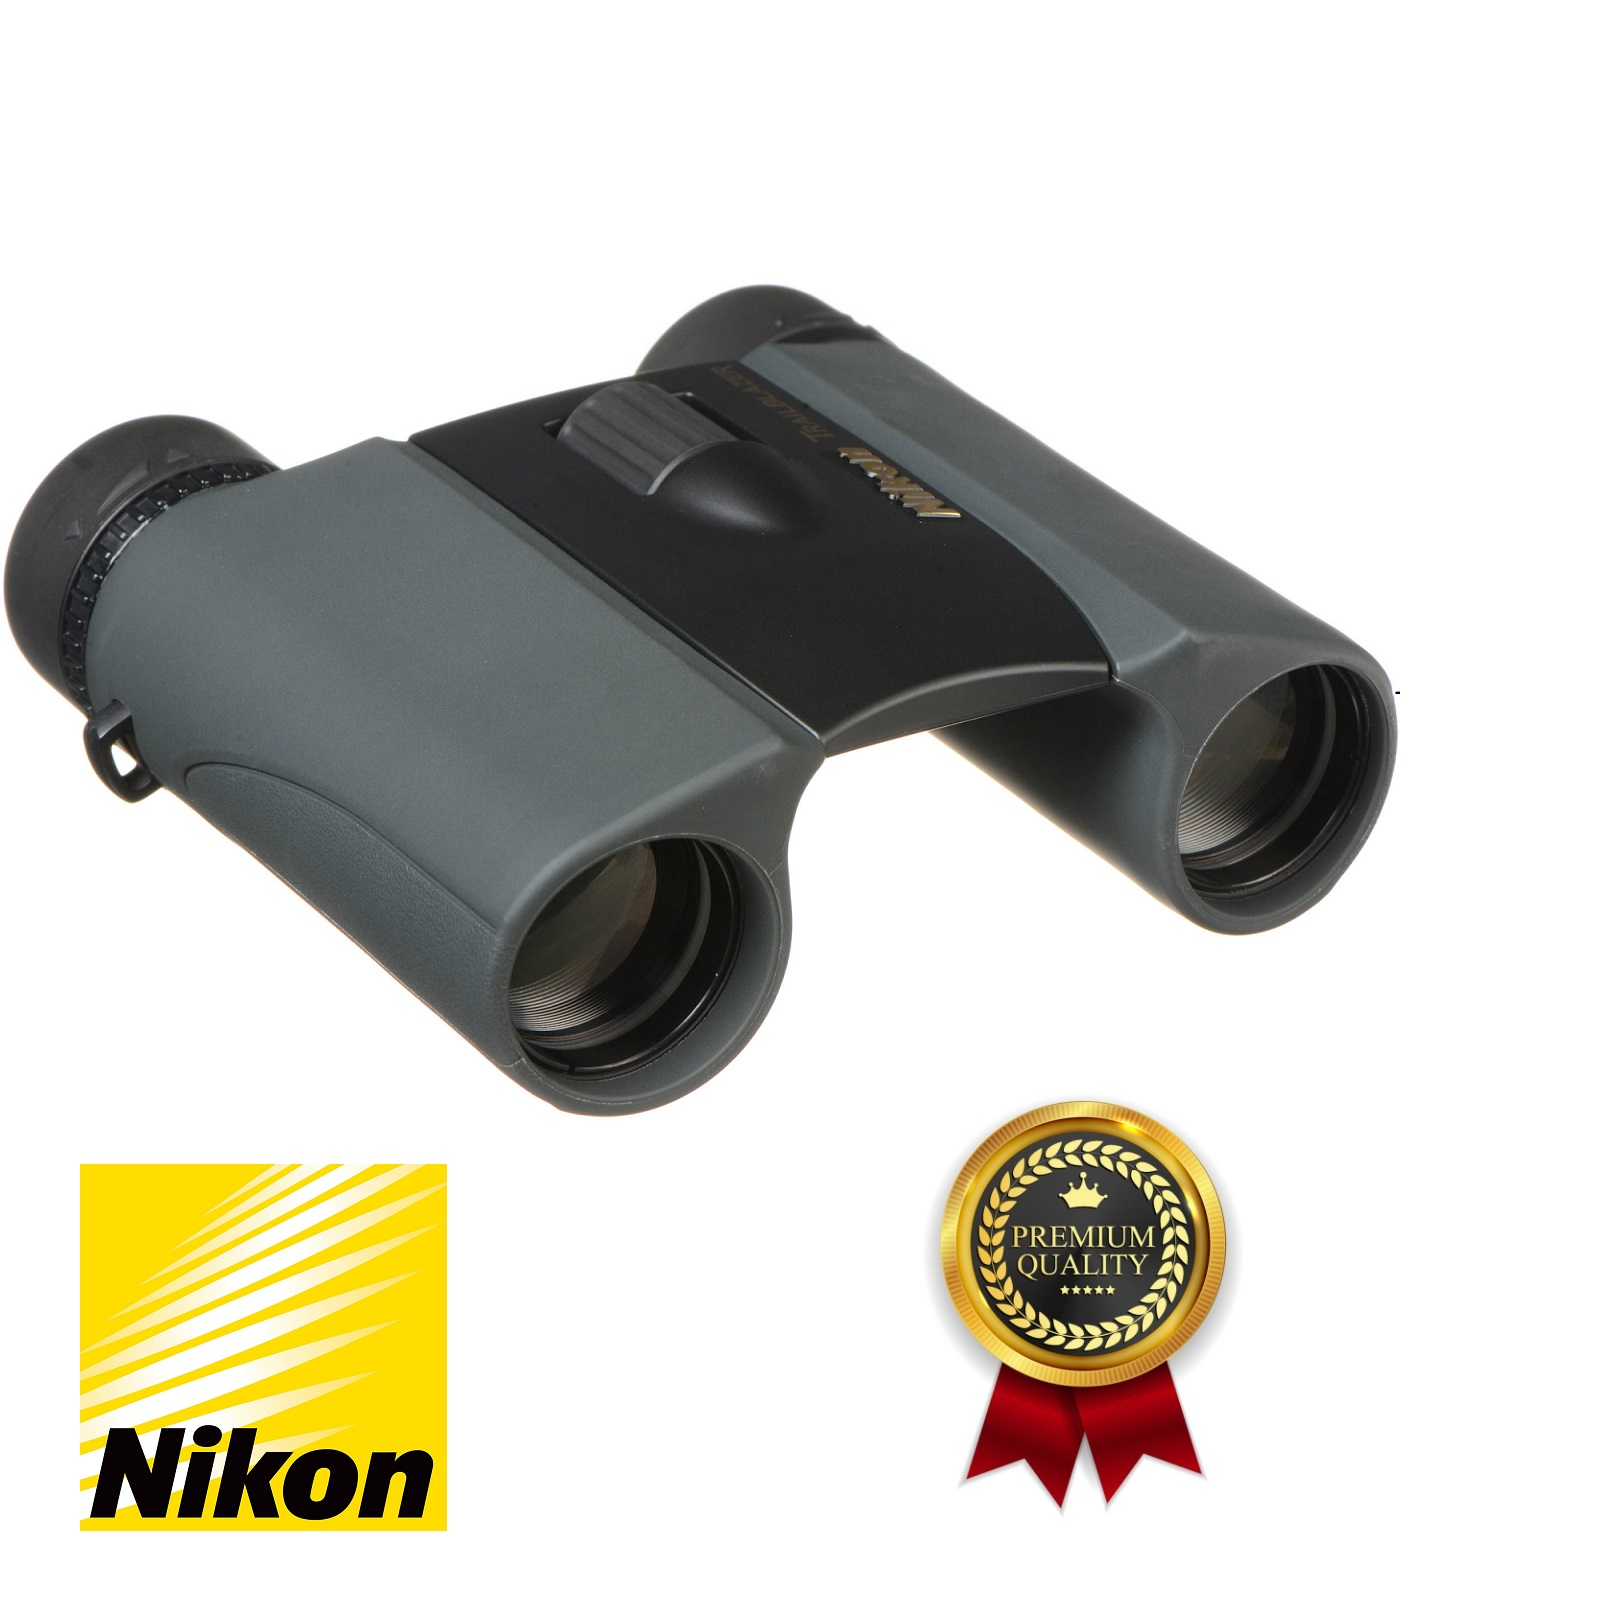 Velbon Binoculars Accessories Tripod Mounting Adapter Binoculars Com Holder Jp Cameras & Photo Binoculars & Telescopes